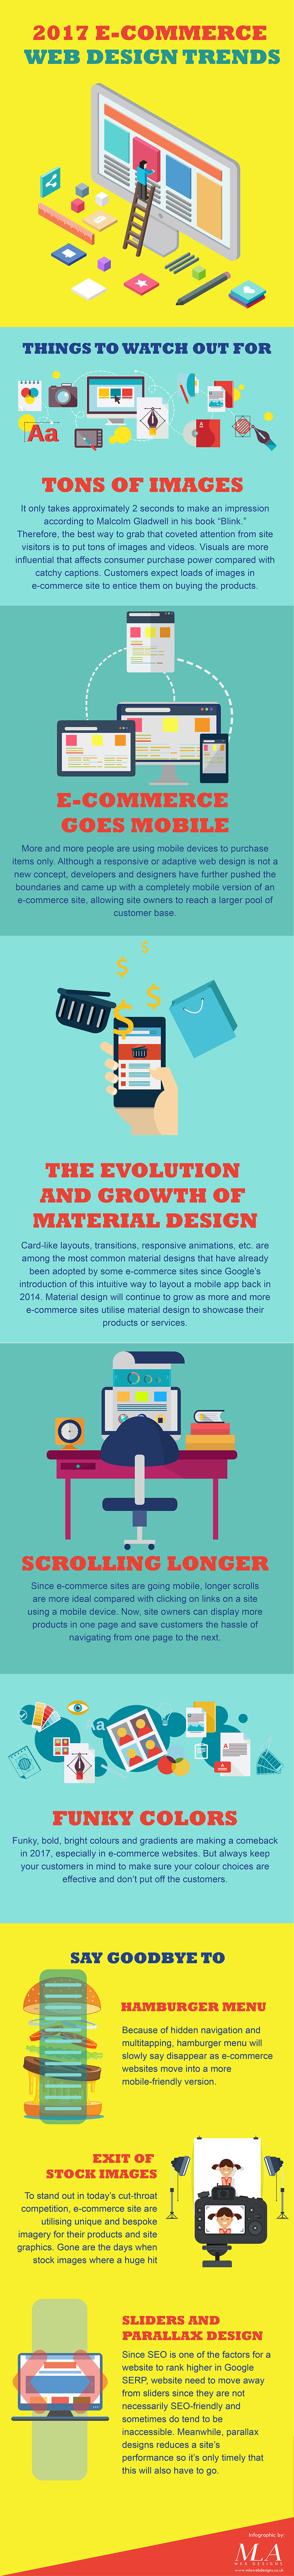 E-Commerce Web Design Trends for 2017